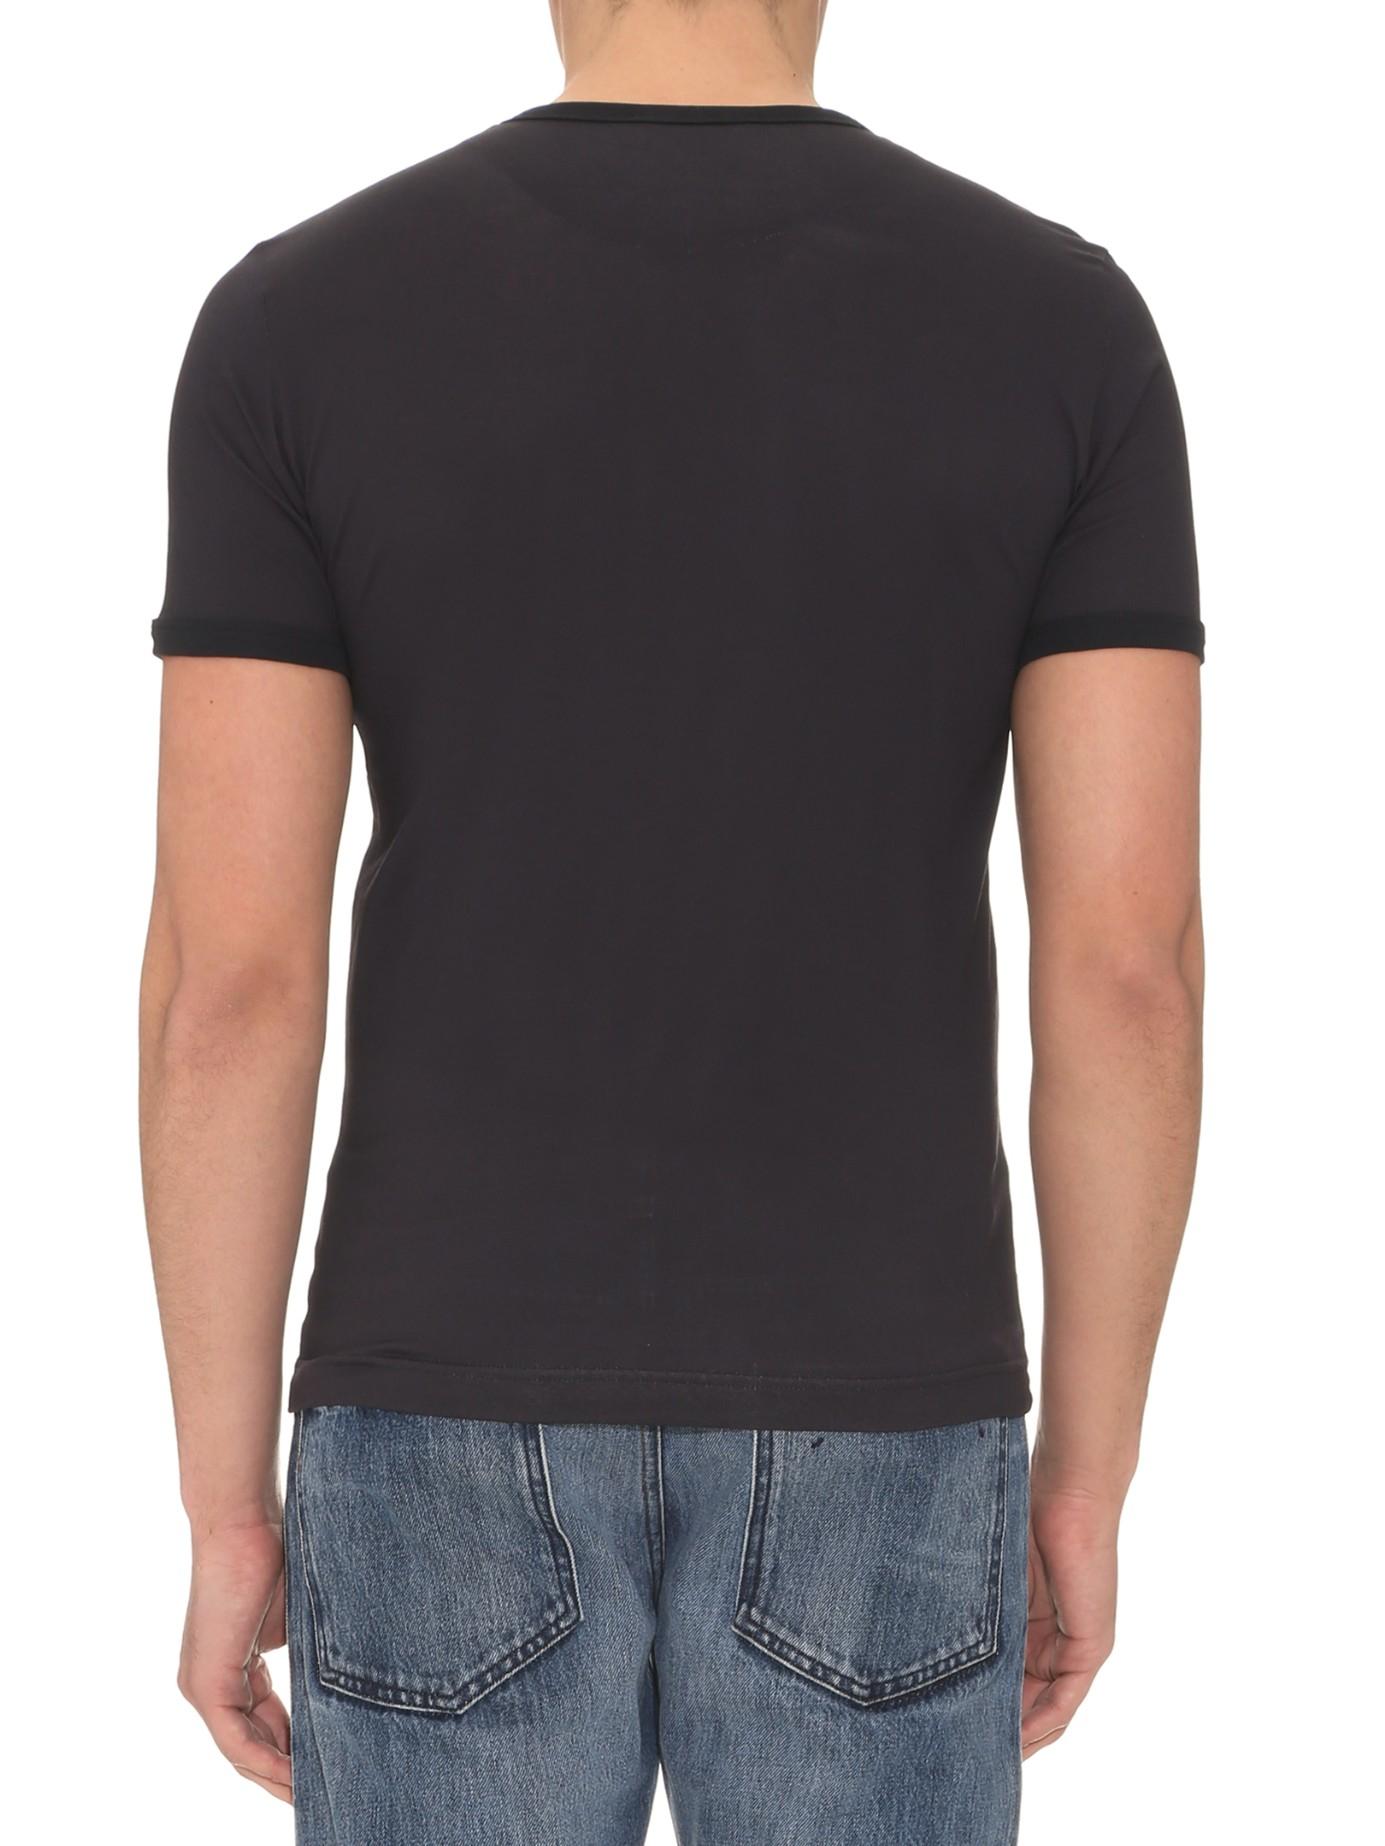 Dolce gabbana dragon print cotton jersey t shirt in for Dolce and gabbana printed t shirts